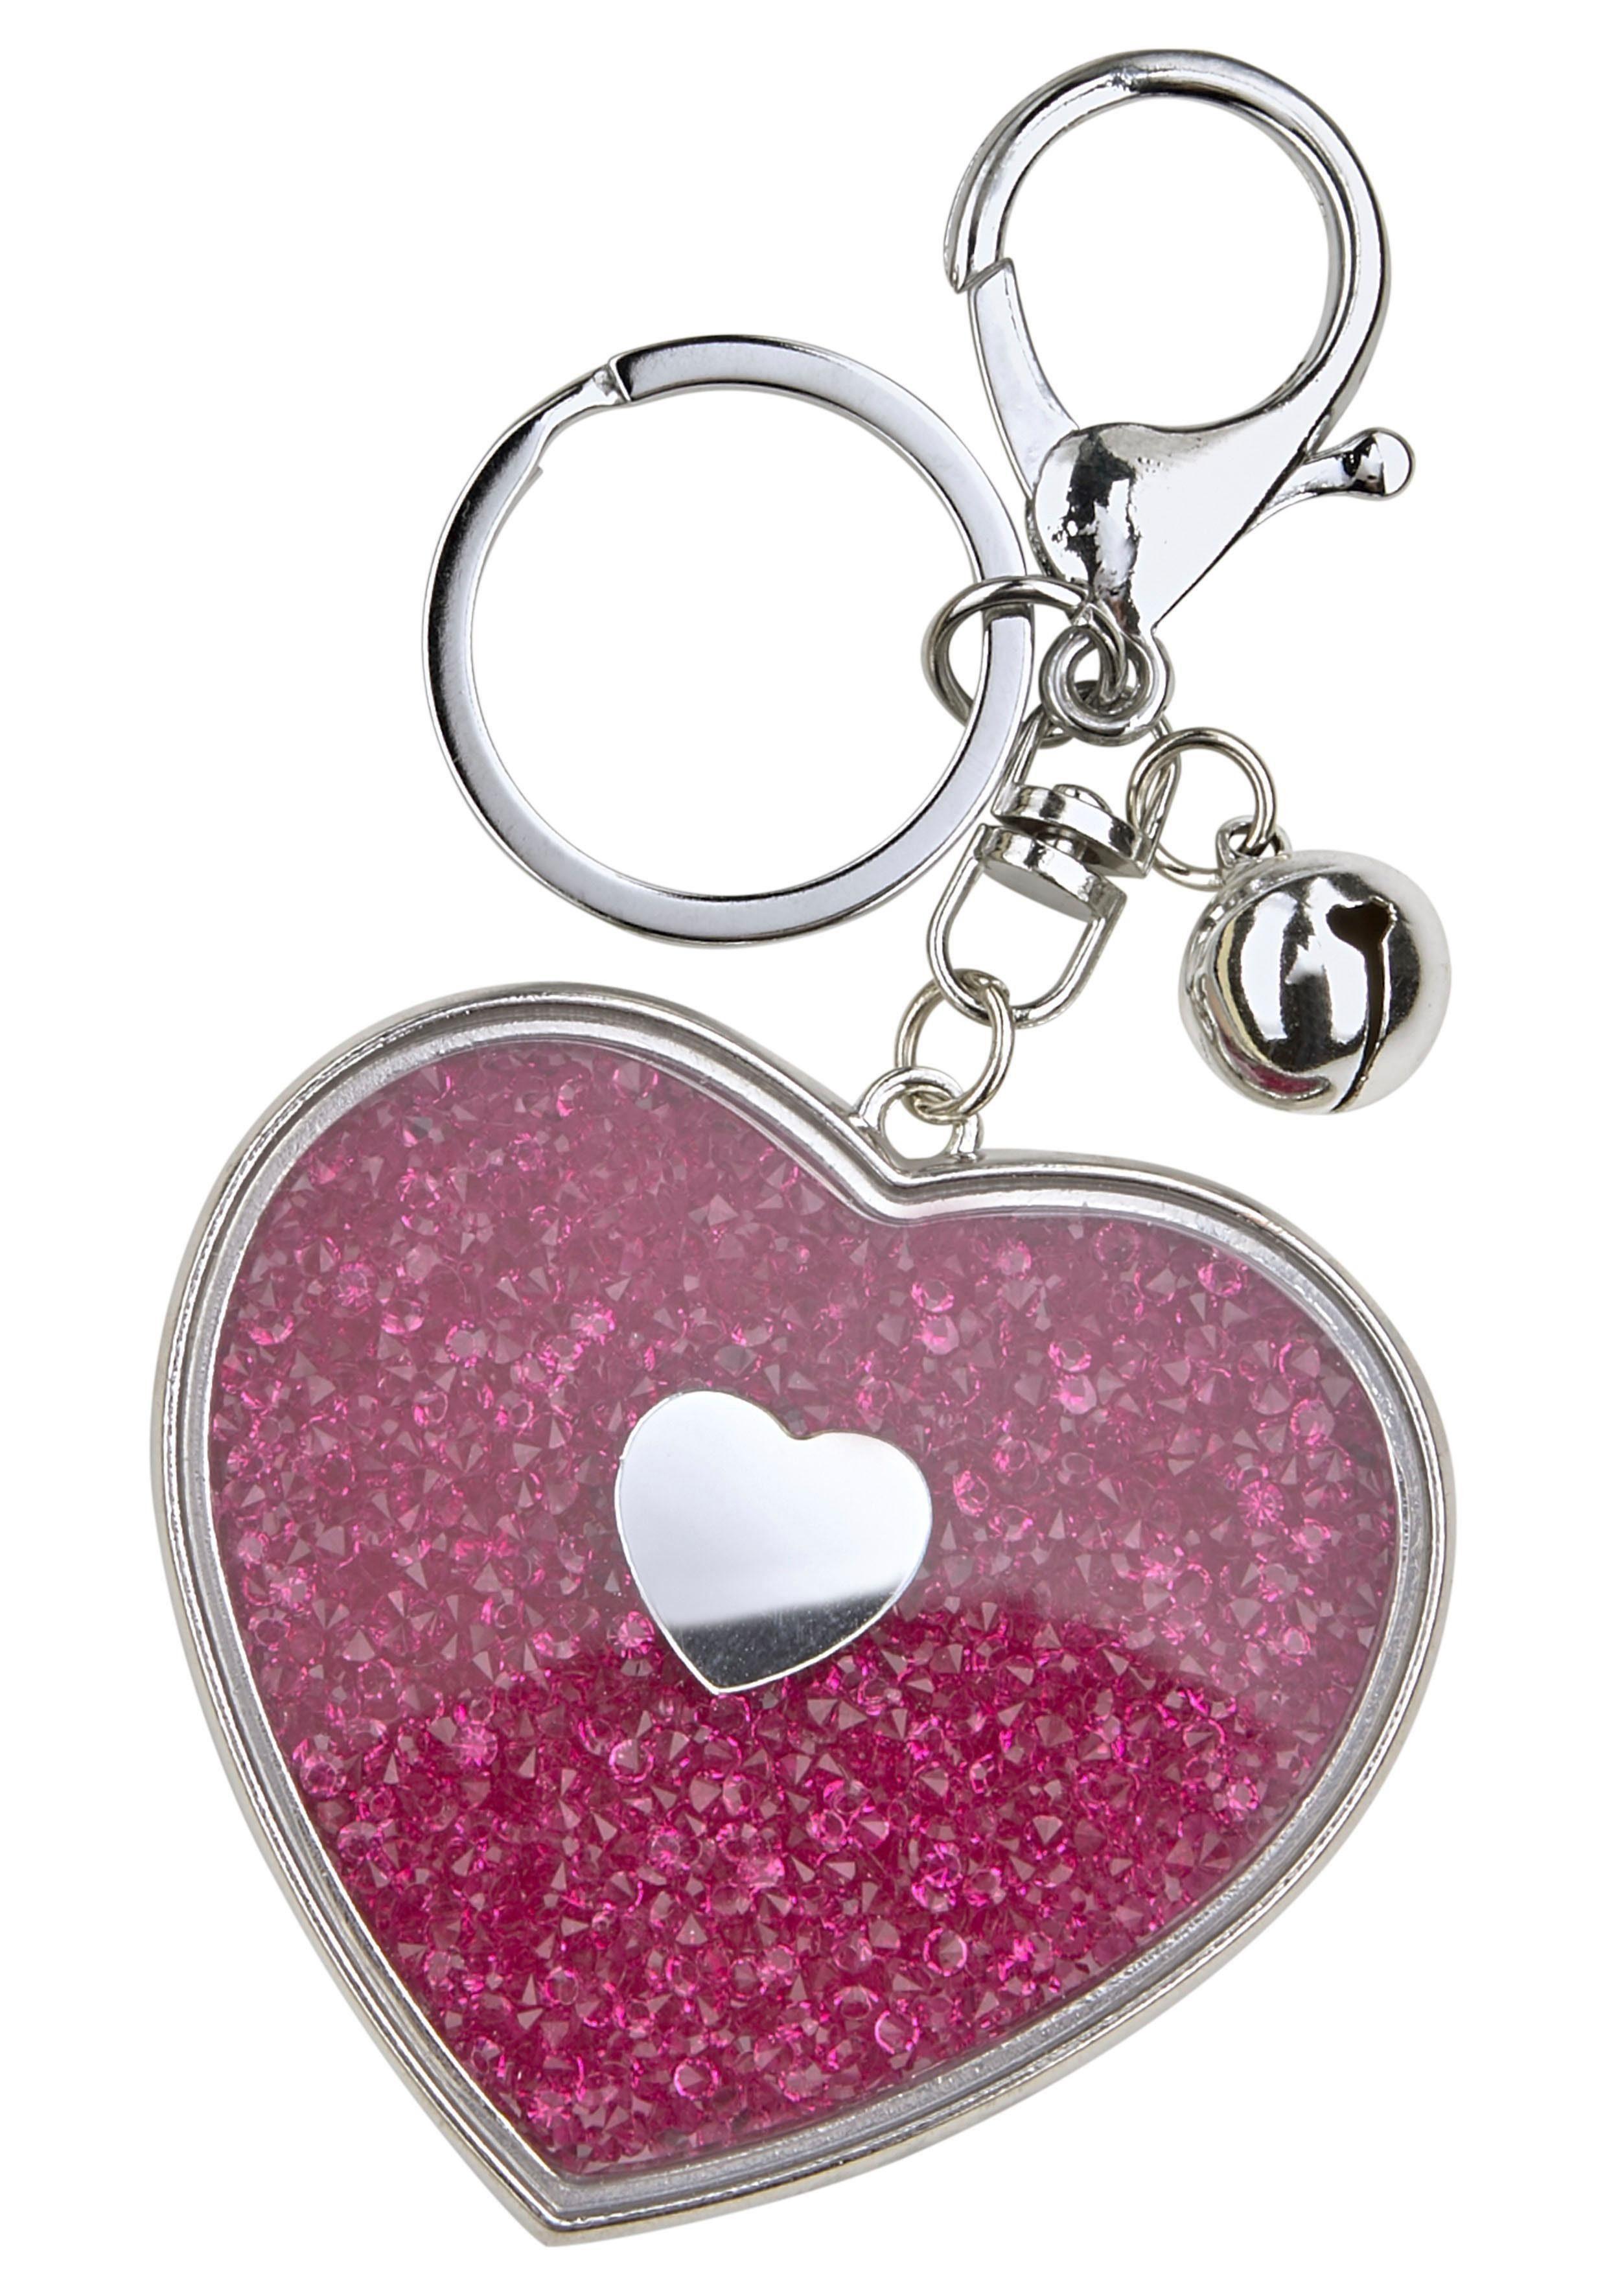 4 cm Verlän Armband Edelstahl Silberfarben Infinity Love Katze Damen 16,5 cm